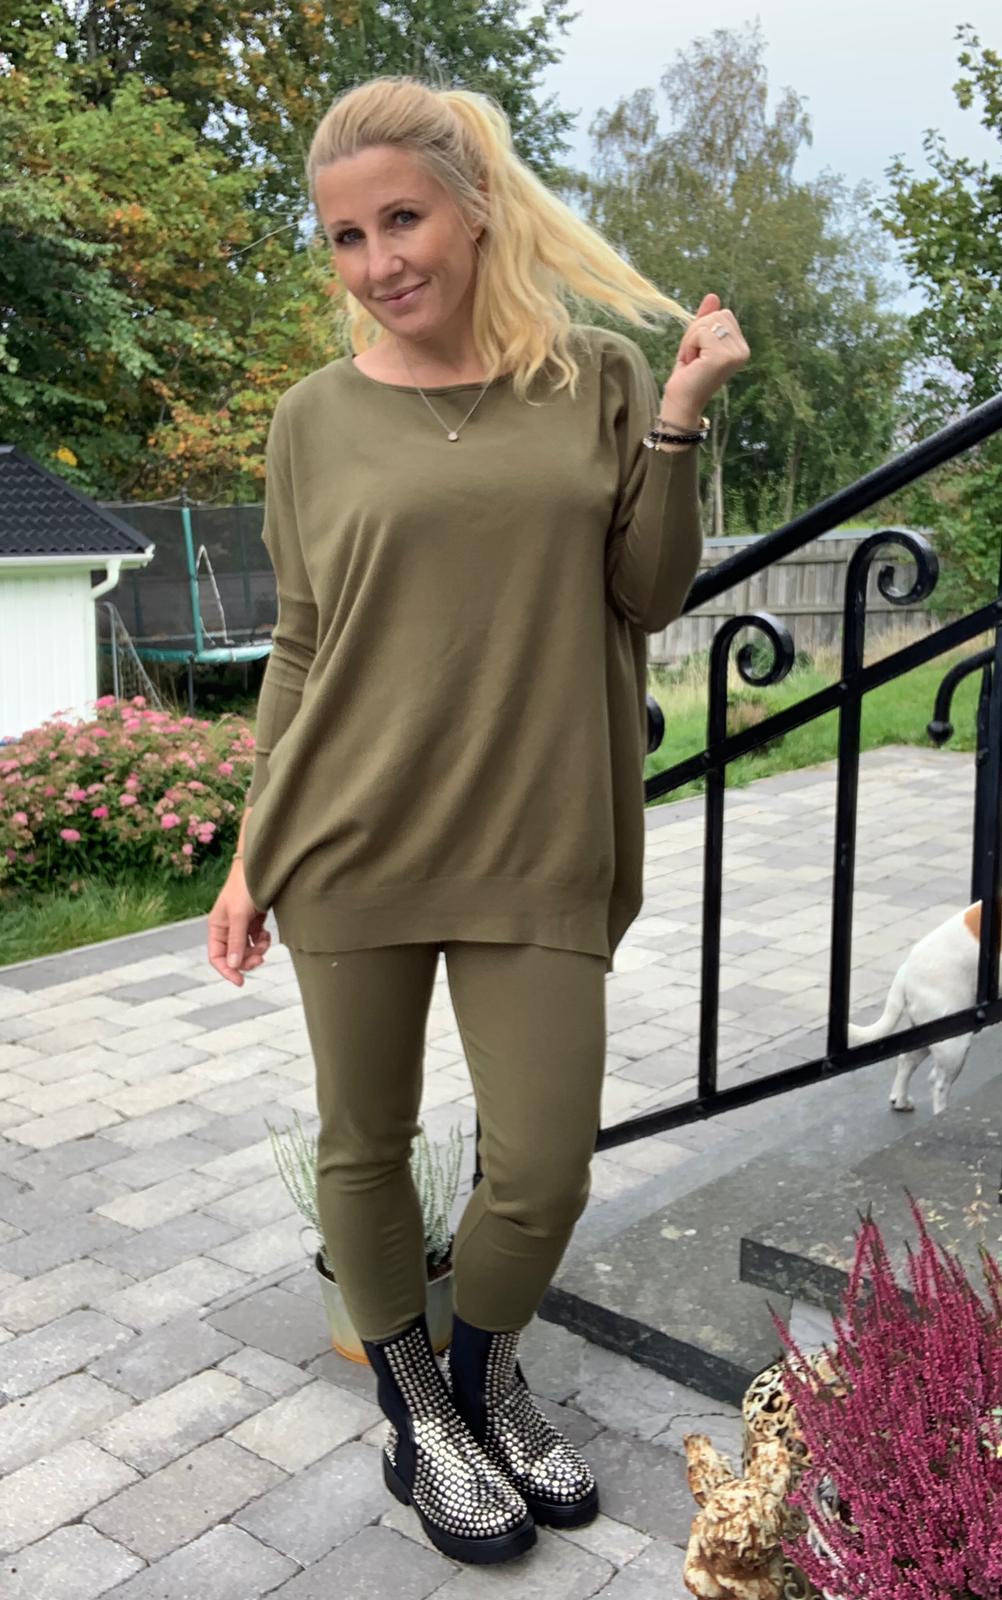 Brittany-khaki-mobil-ute